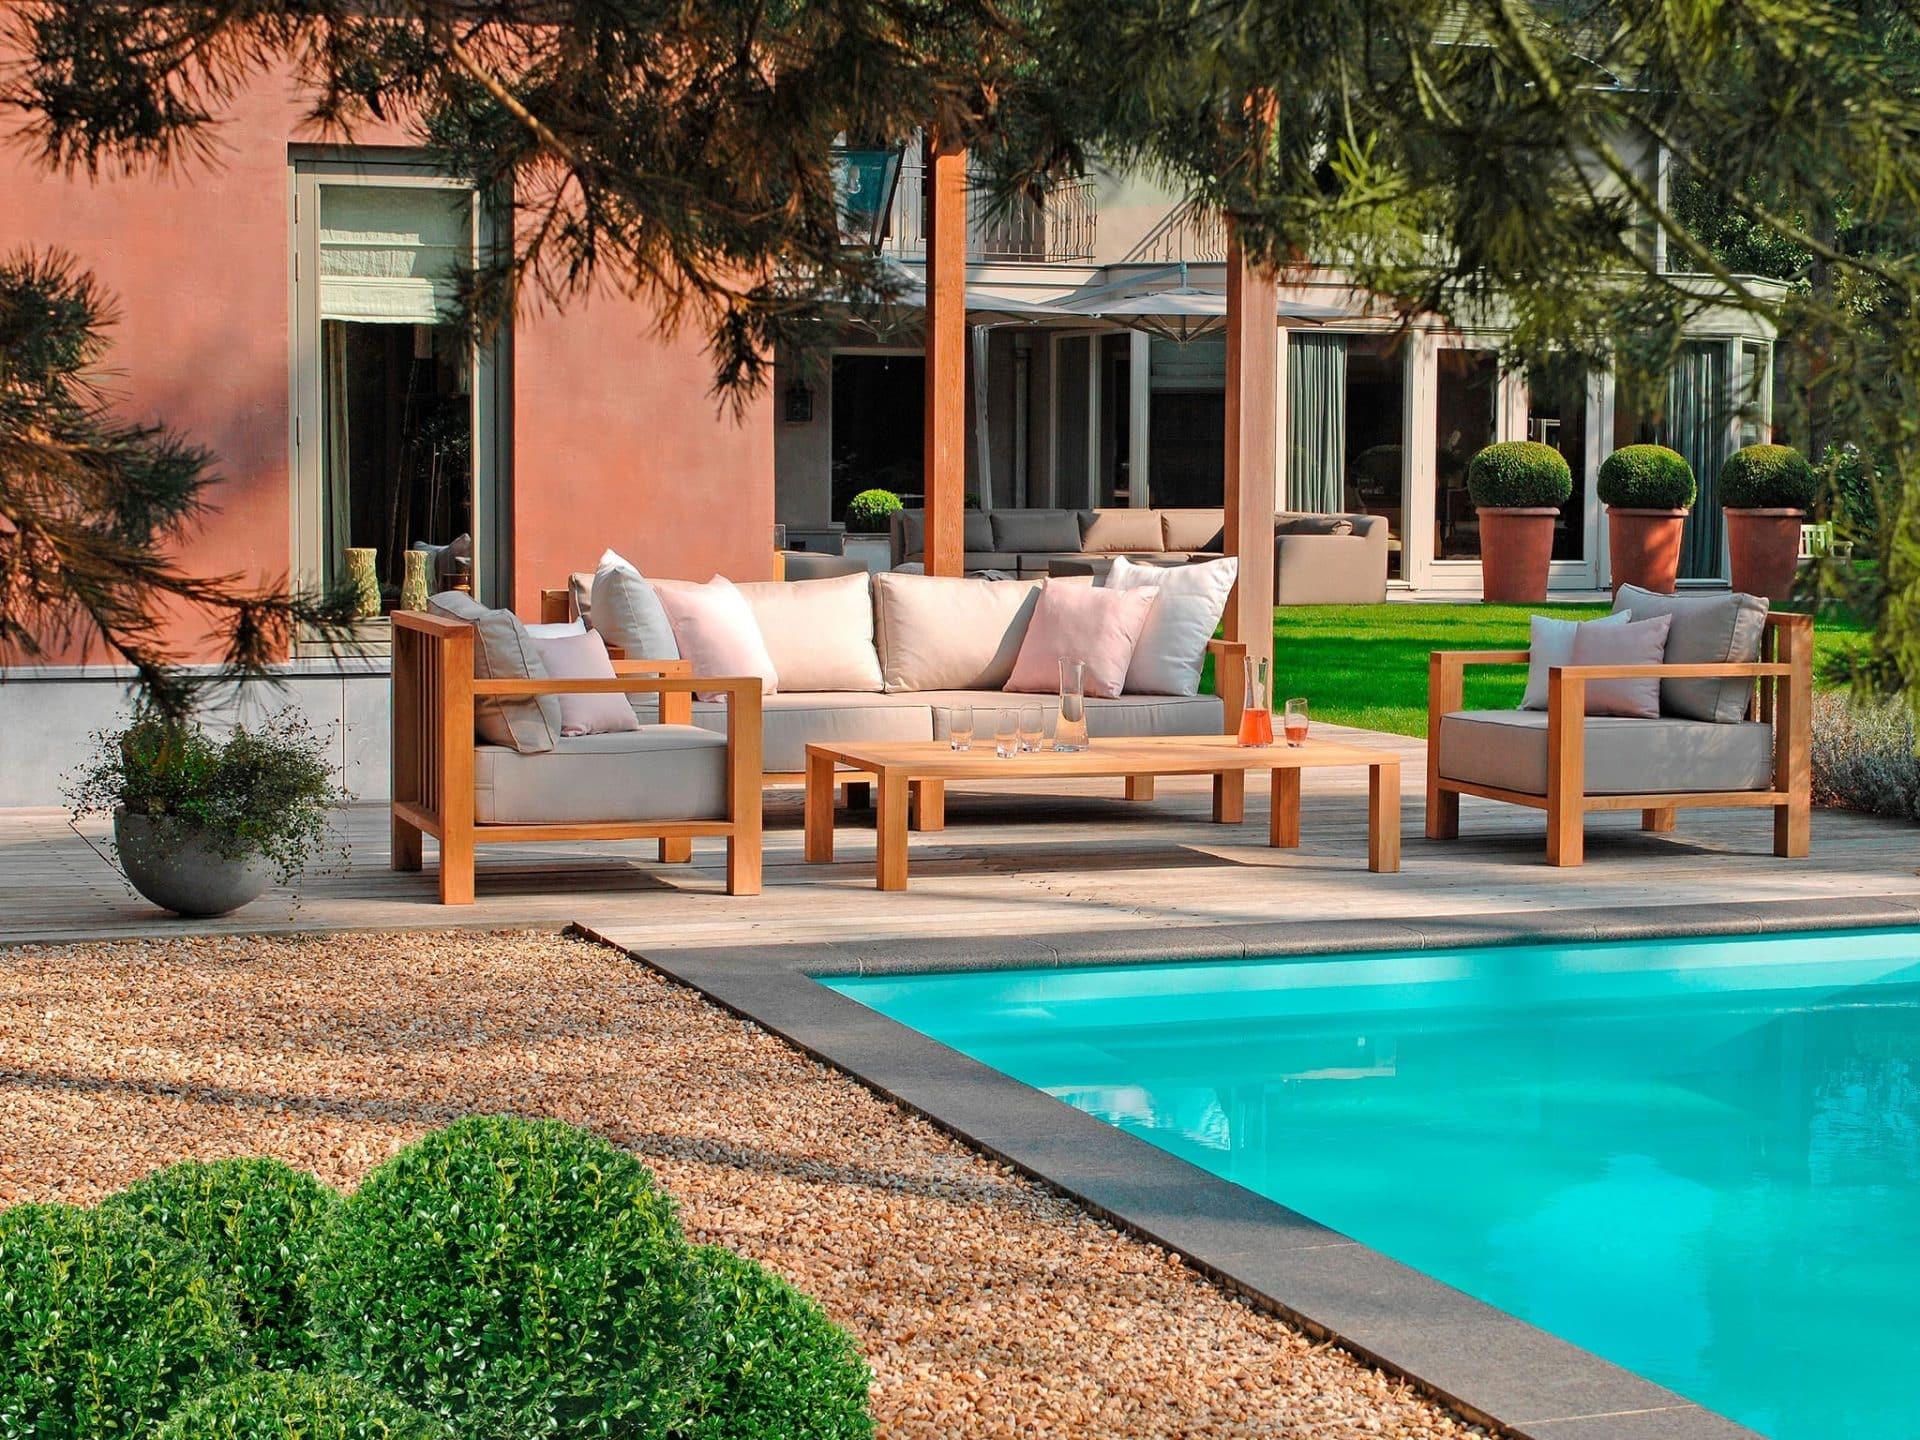 terrassengestaltung 20 moderne gem tliche ideen. Black Bedroom Furniture Sets. Home Design Ideas